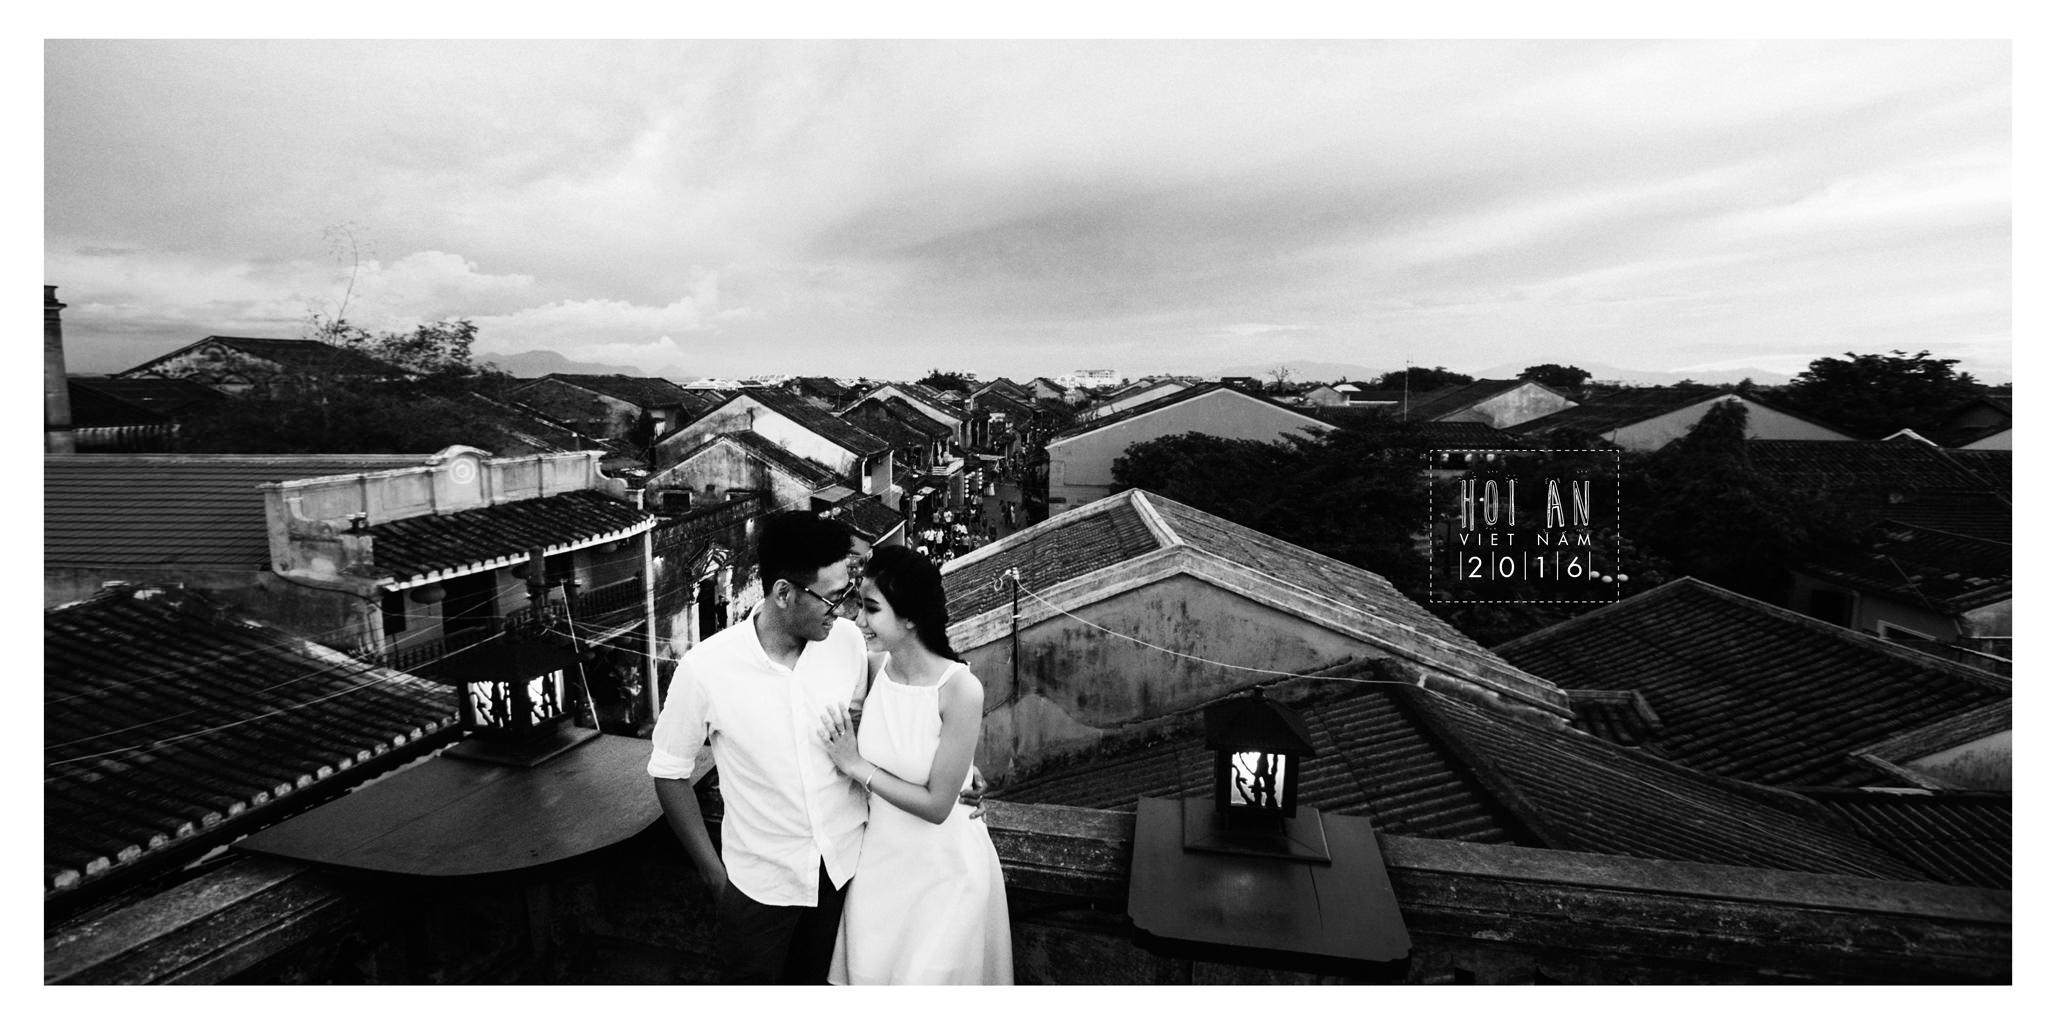 Layout_Toan_&_Trang (16).jpg